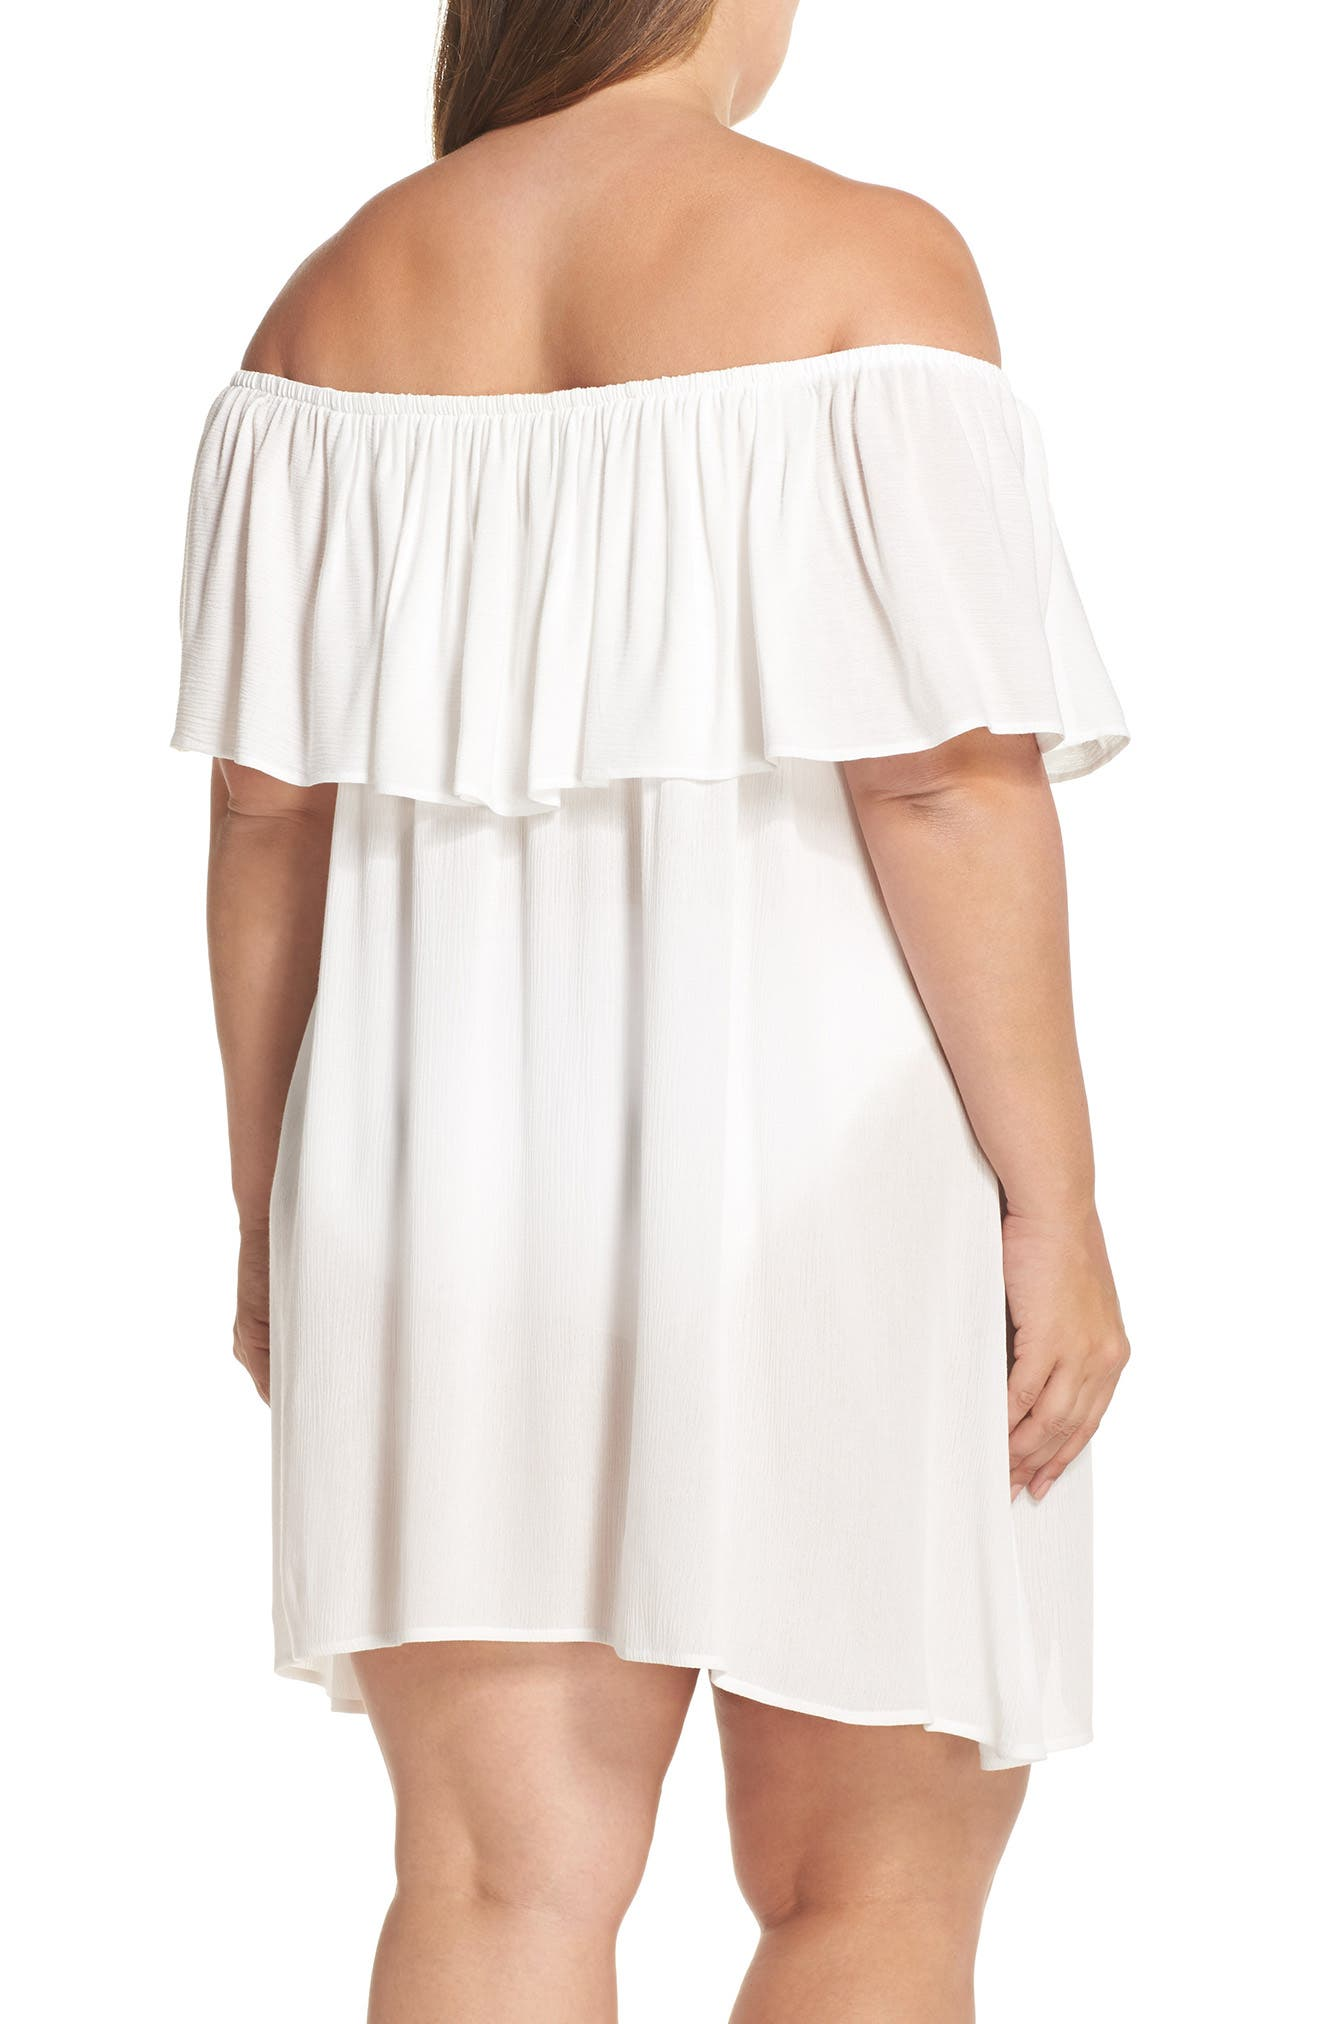 Southern Belle Off the Shoulder Cover-Up Dress,                             Alternate thumbnail 4, color,